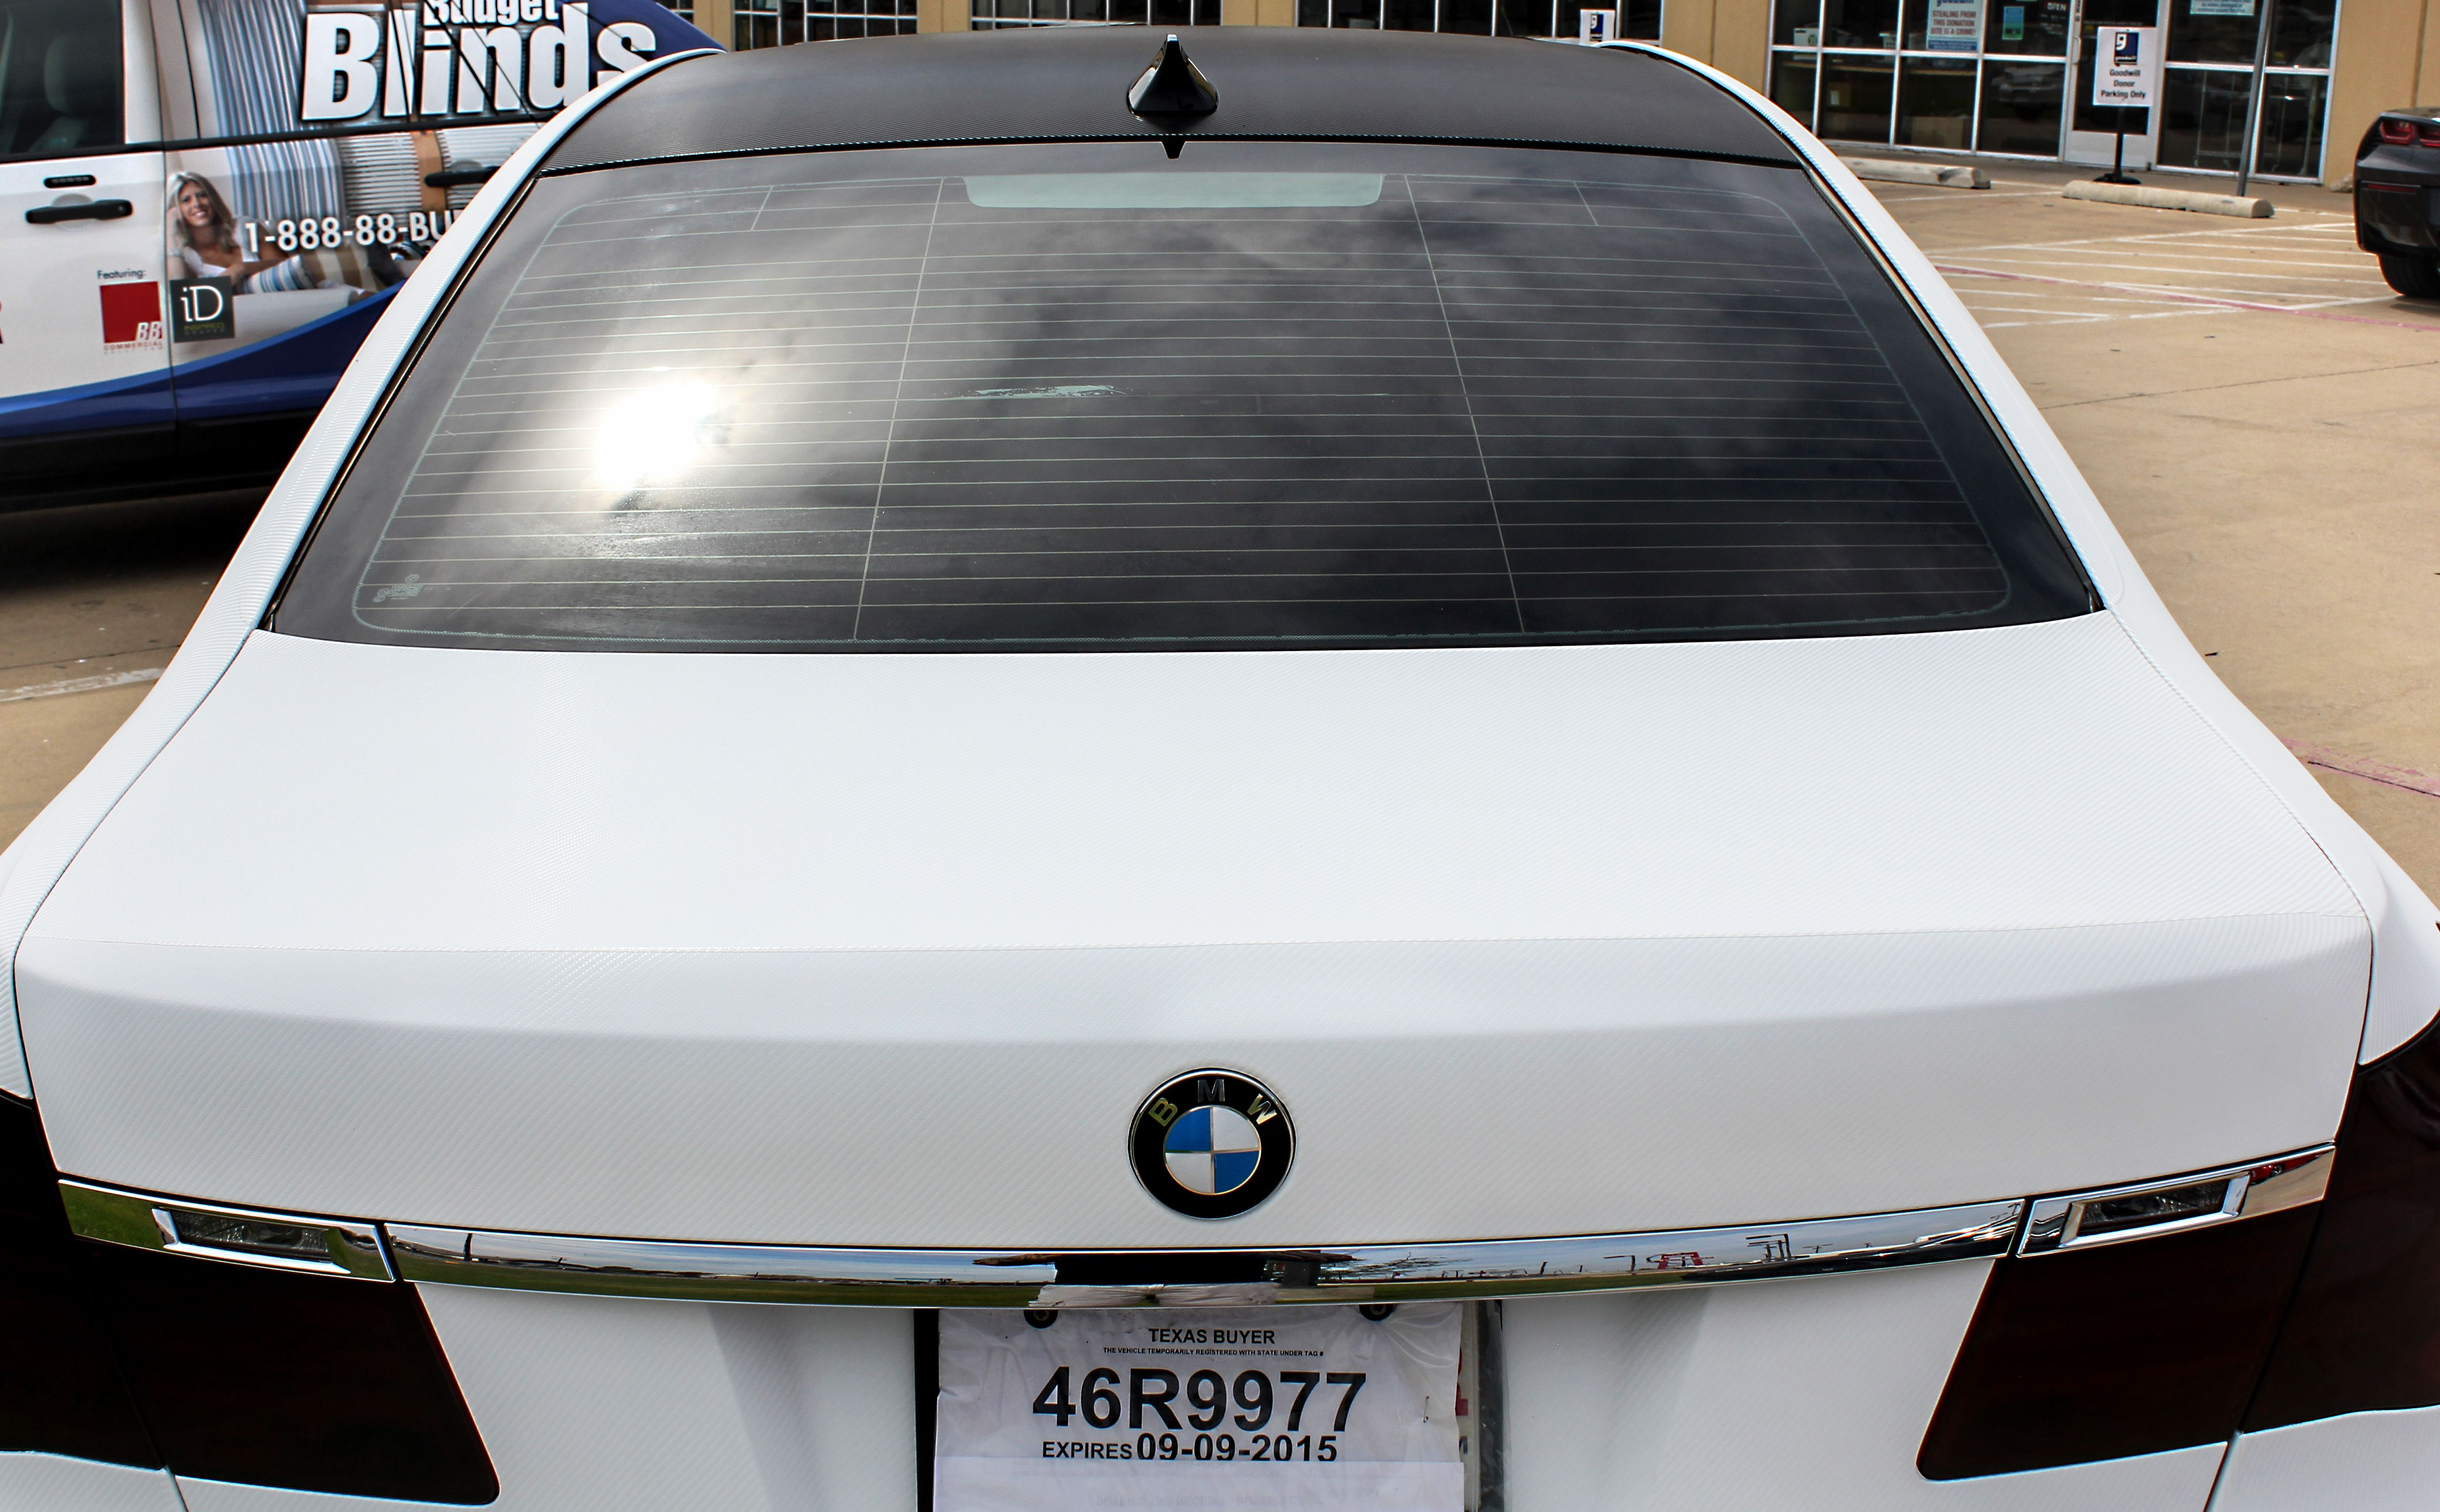 Full Carbon Fiber Wrap White and Black   Carbon Fiber Wraps